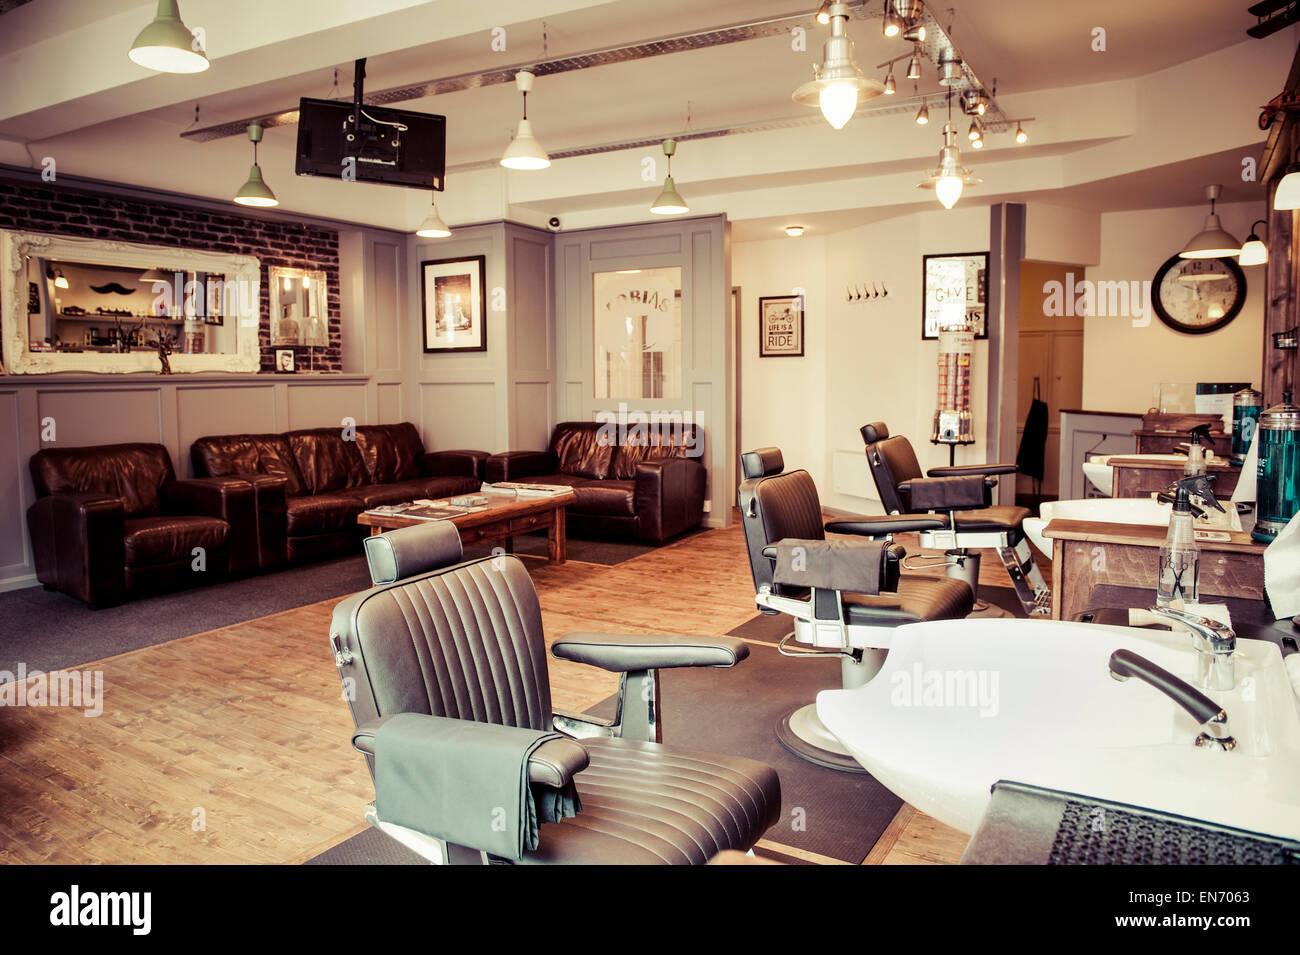 Men 39 s barber shop retro styled interior design stock photo royalty free image 81903083 alamy - Barber shop interior ...